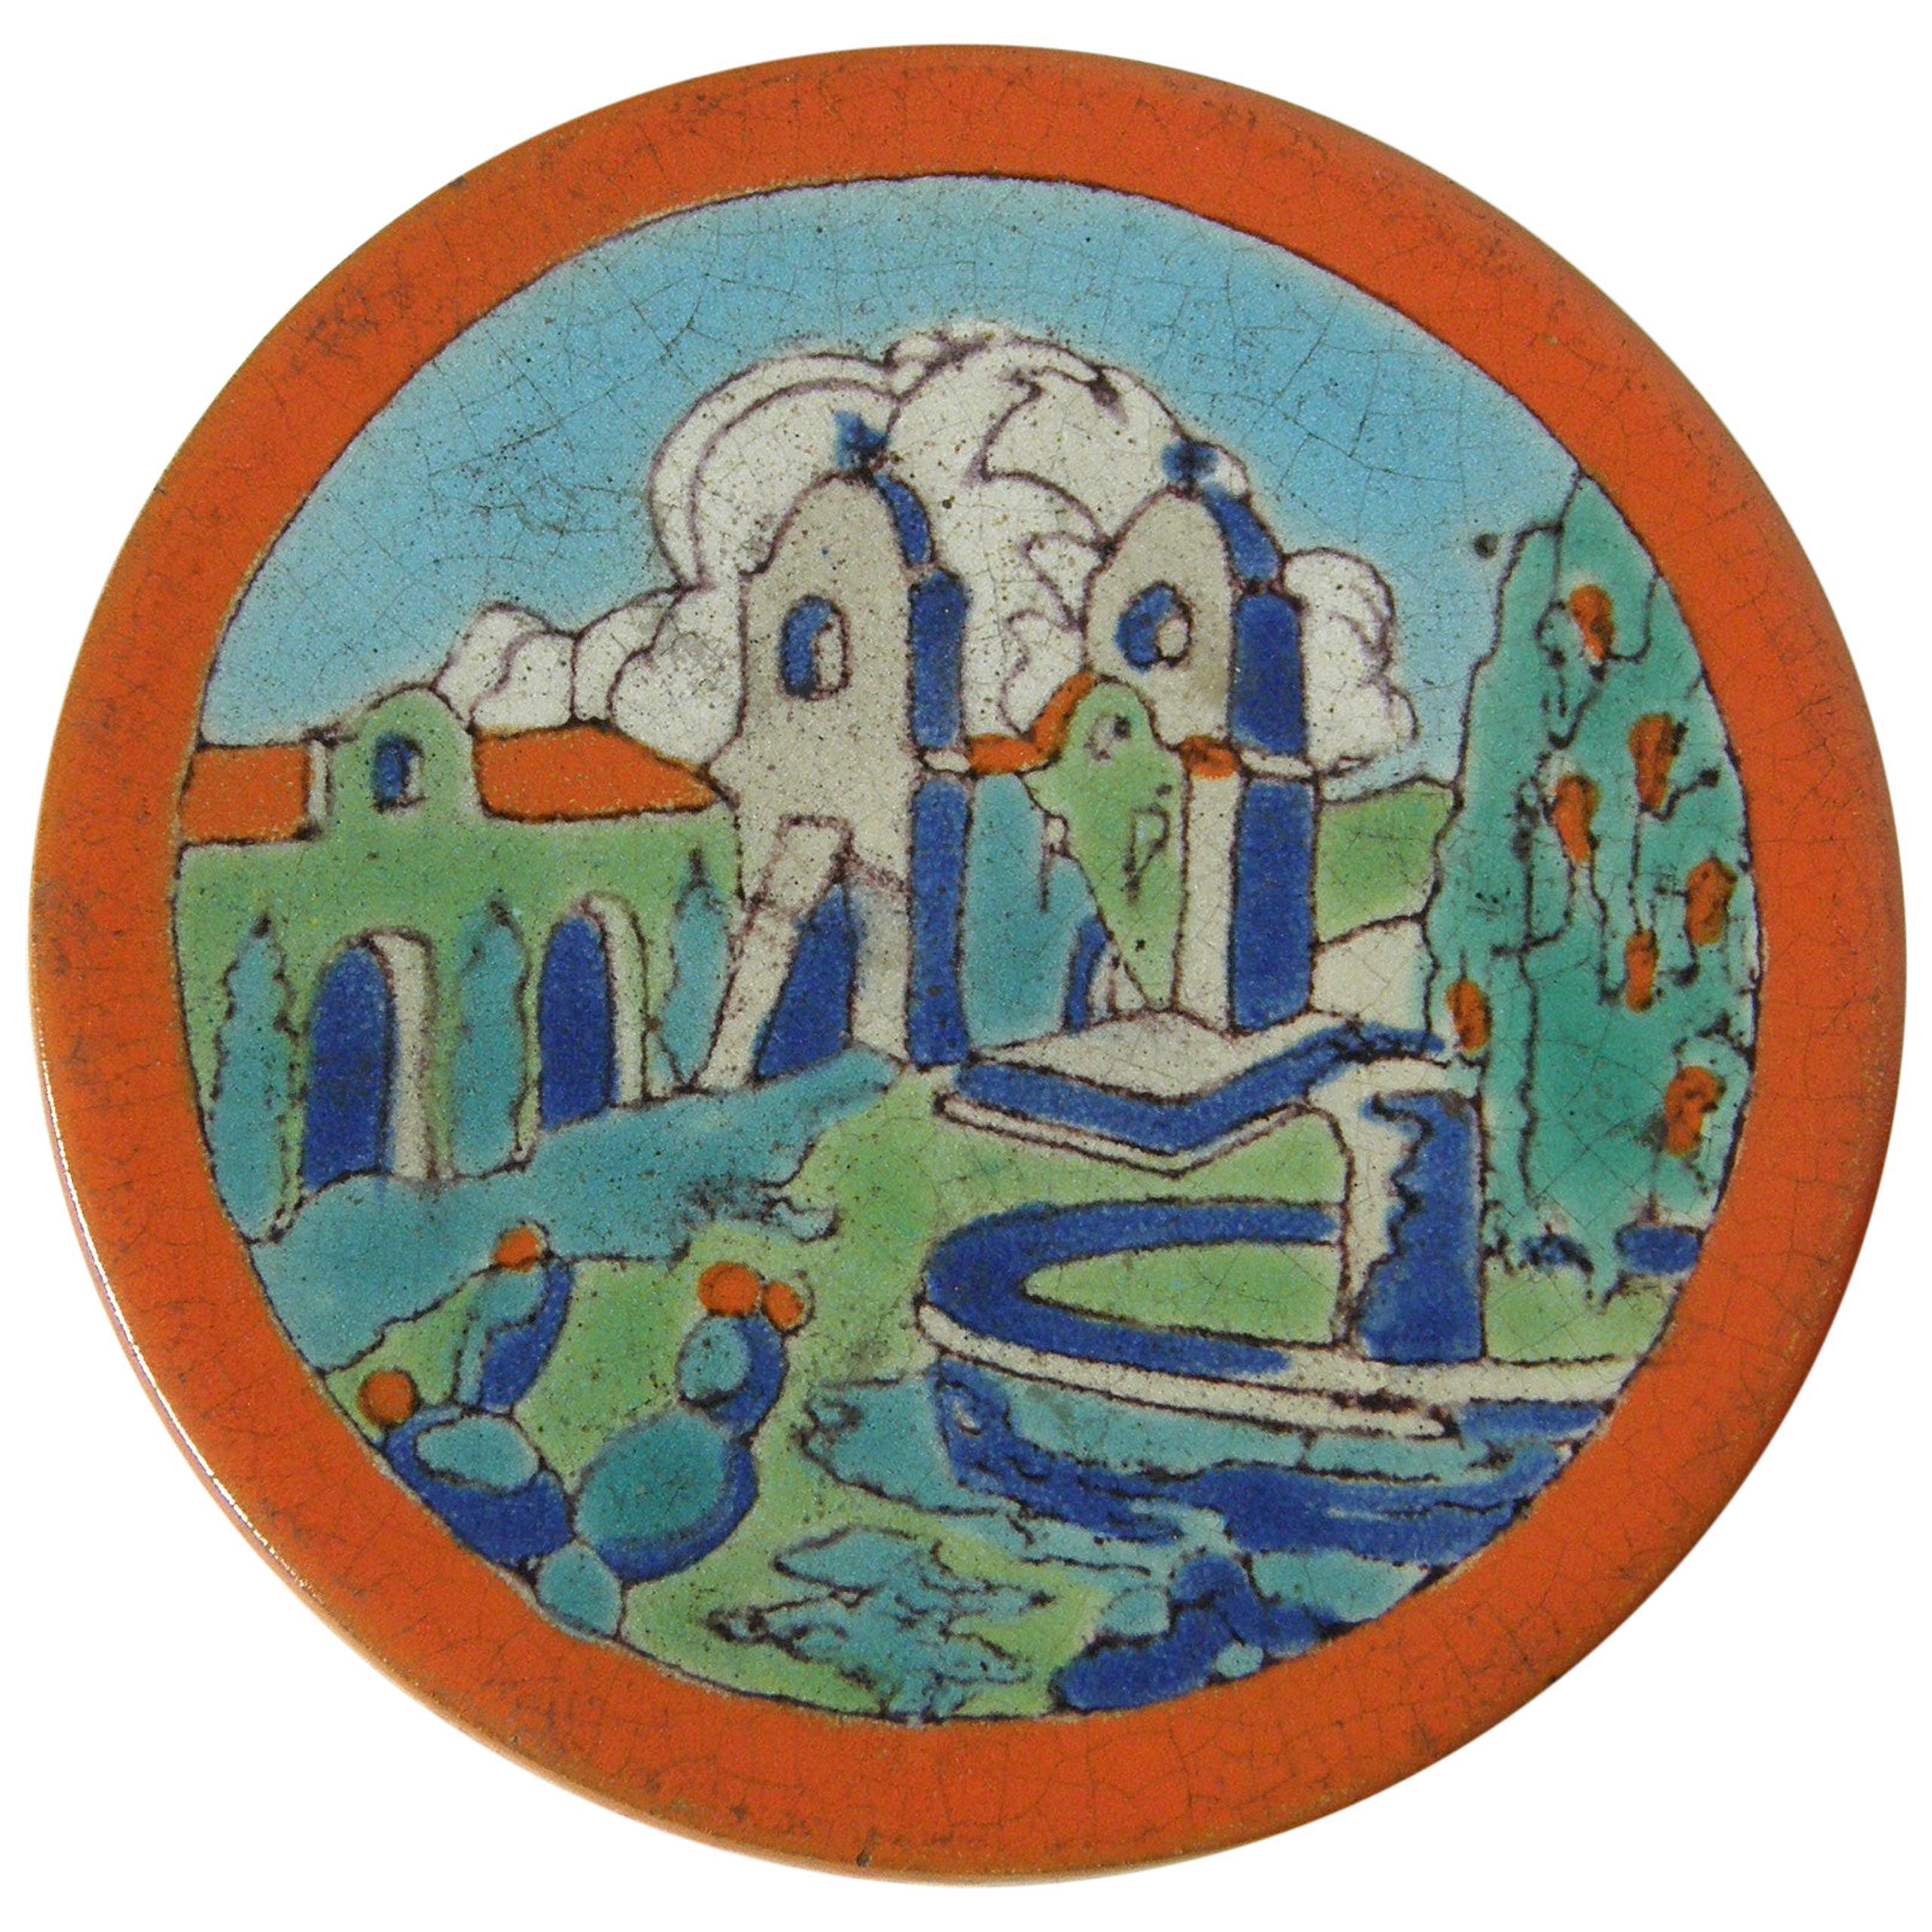 1930s Davies & McDonald California Pottery Tea Tile Trivet with Mission D&M